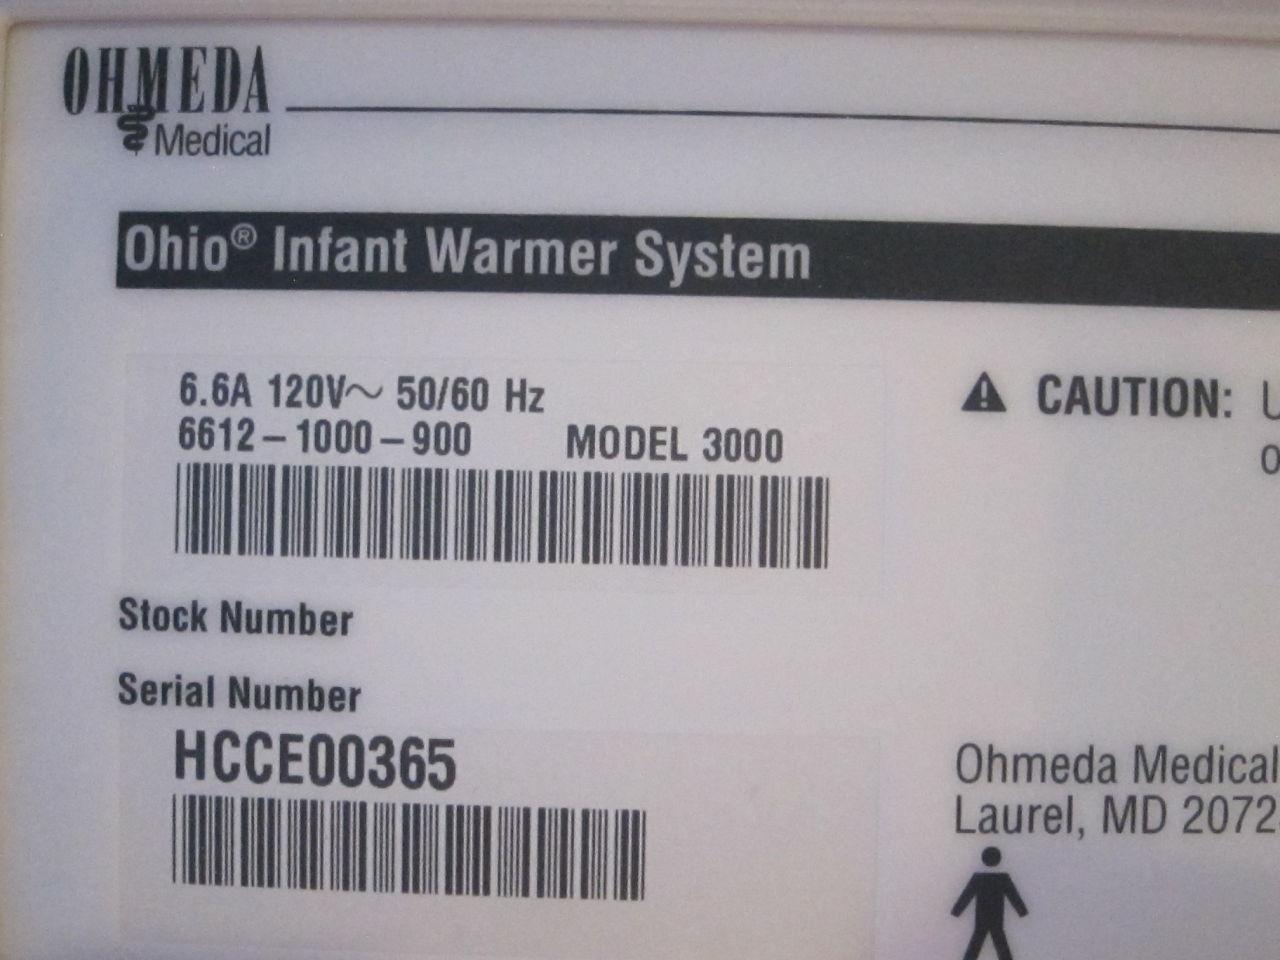 OHMEDA Ohio 3000 Infant Warmer